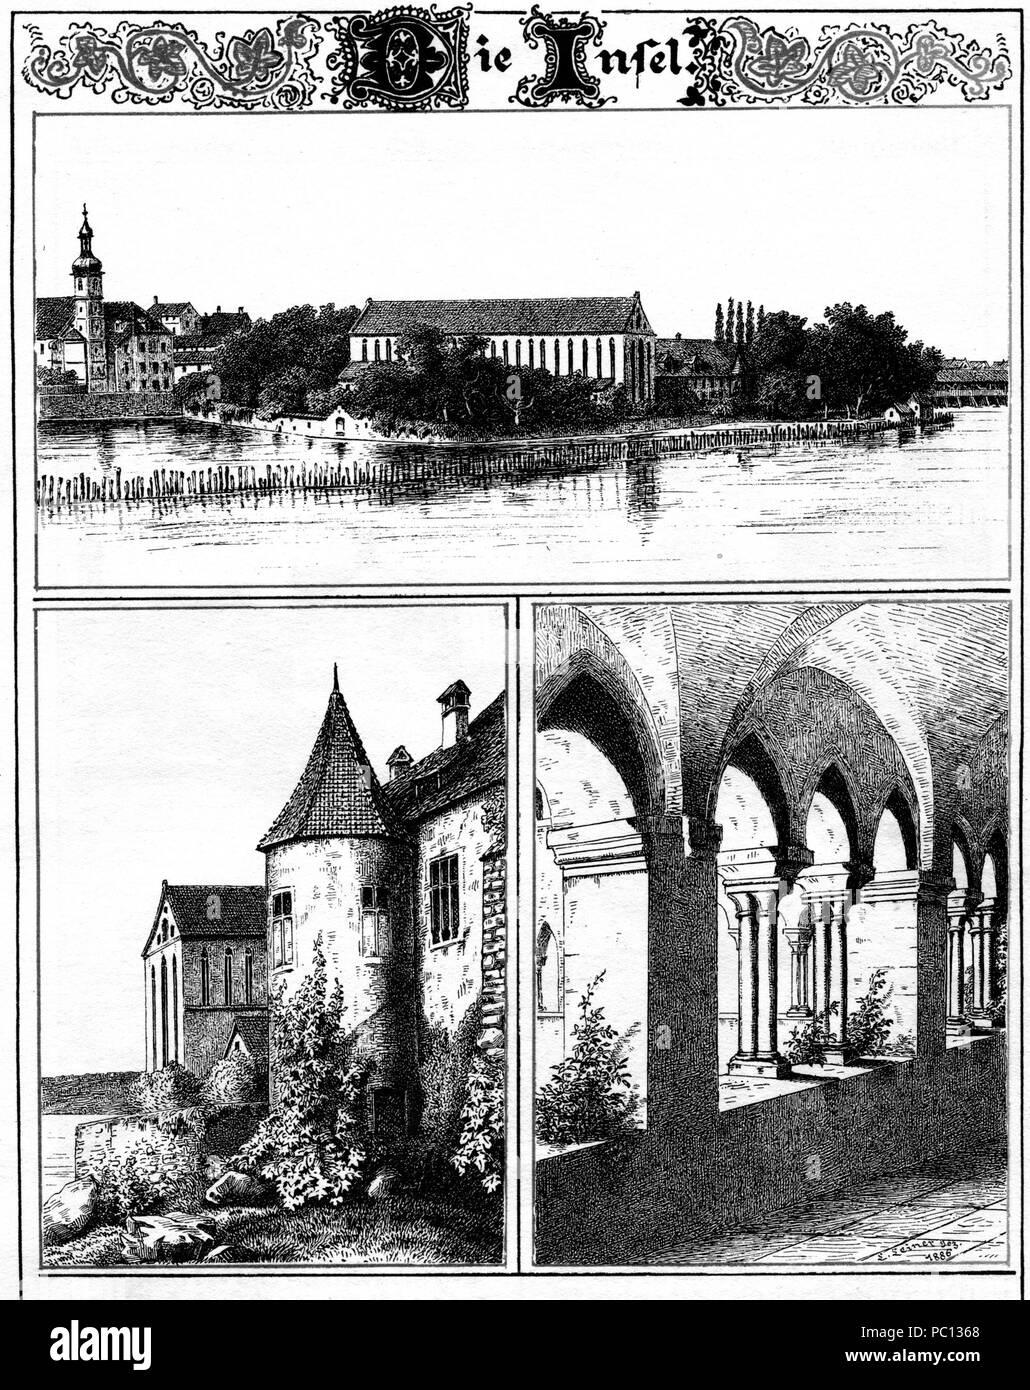 366 Leiner Konstanz Insel - Stock Image